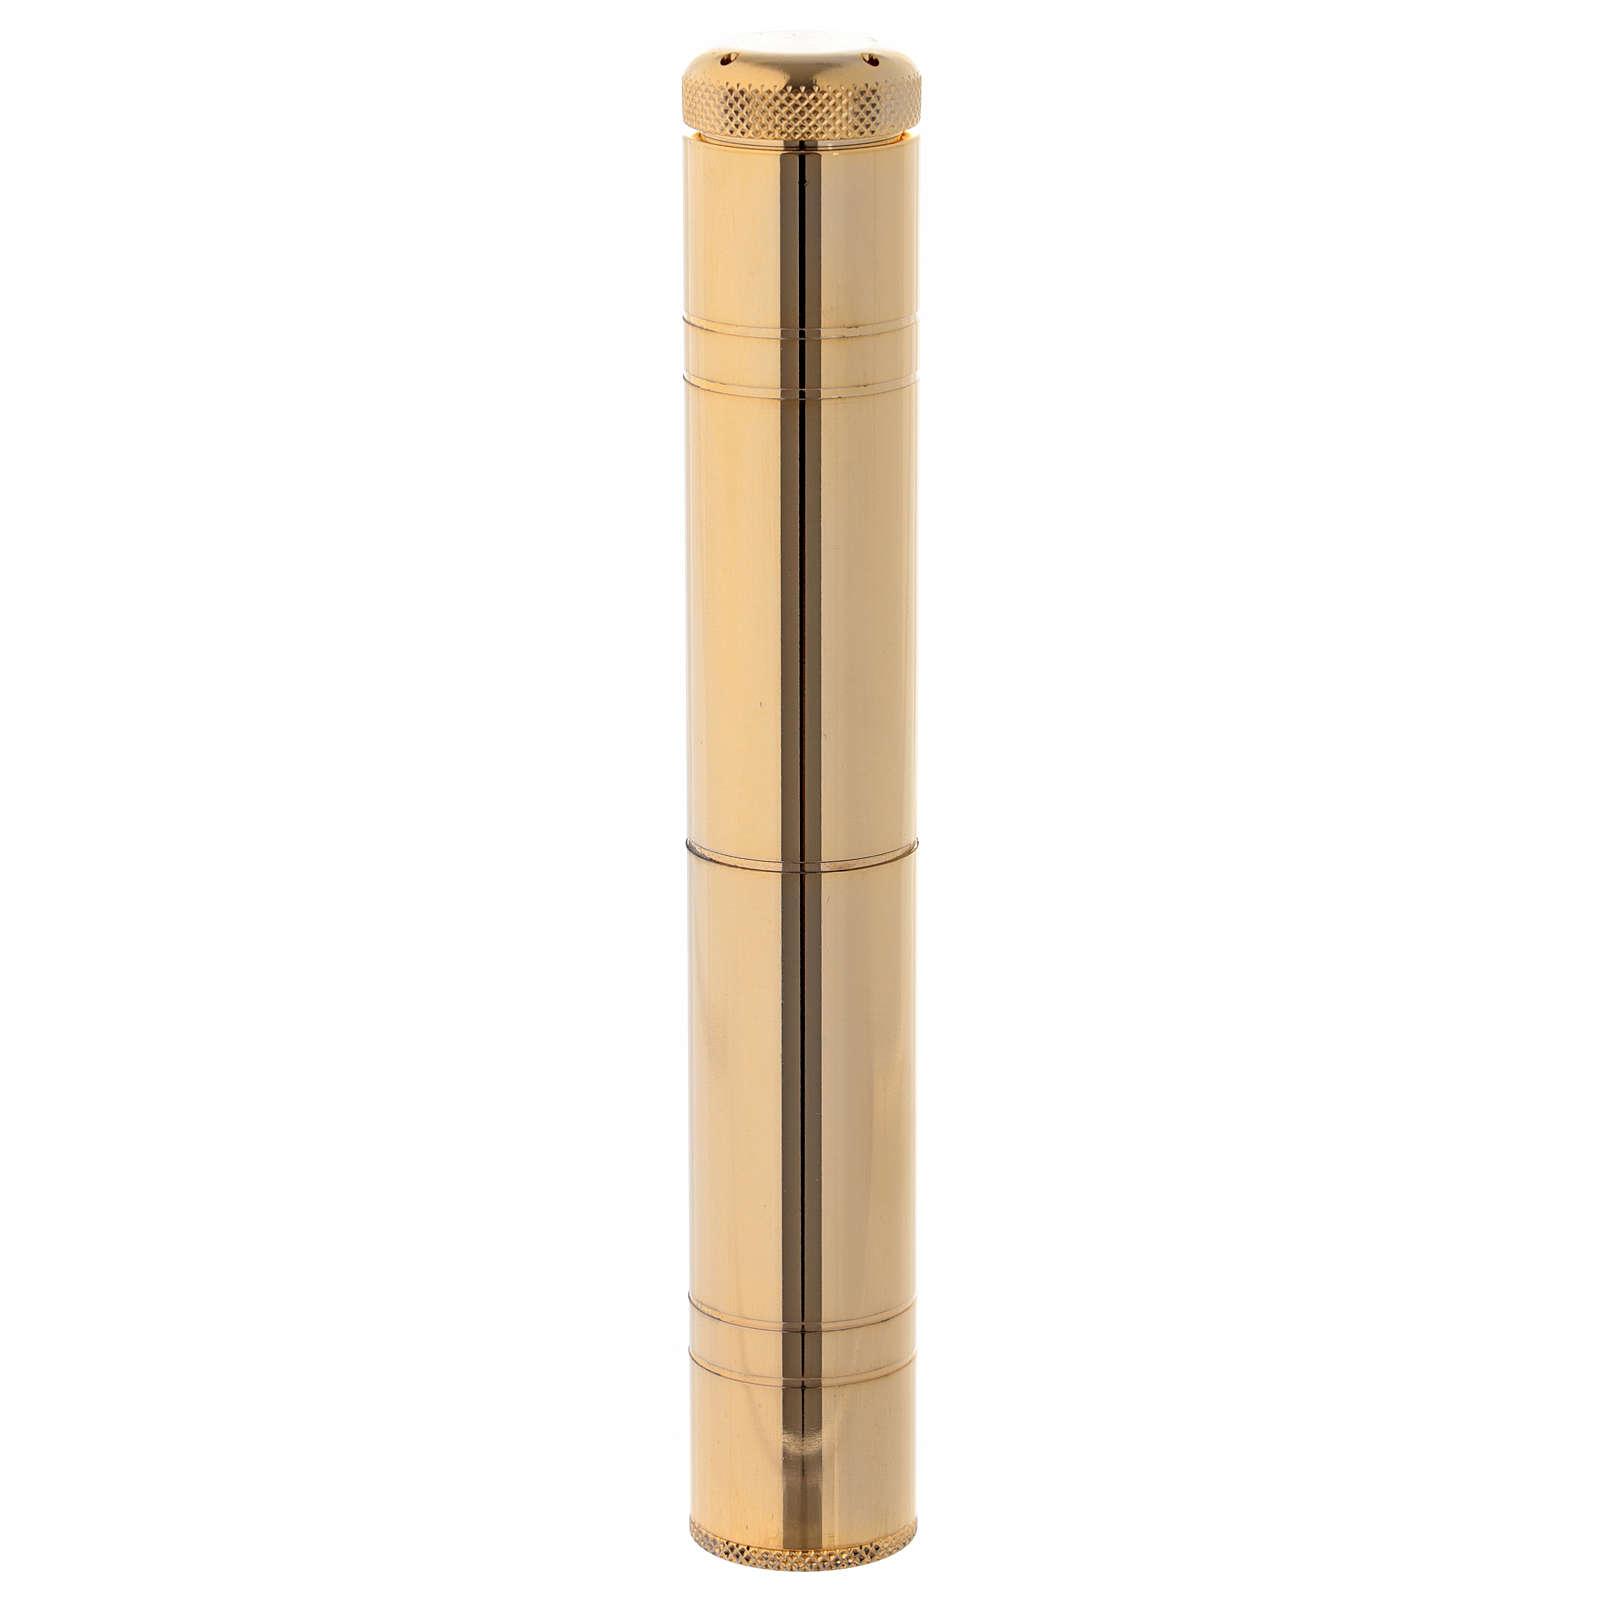 Aspersorio de bolsillo latón dorado 16 cm 3